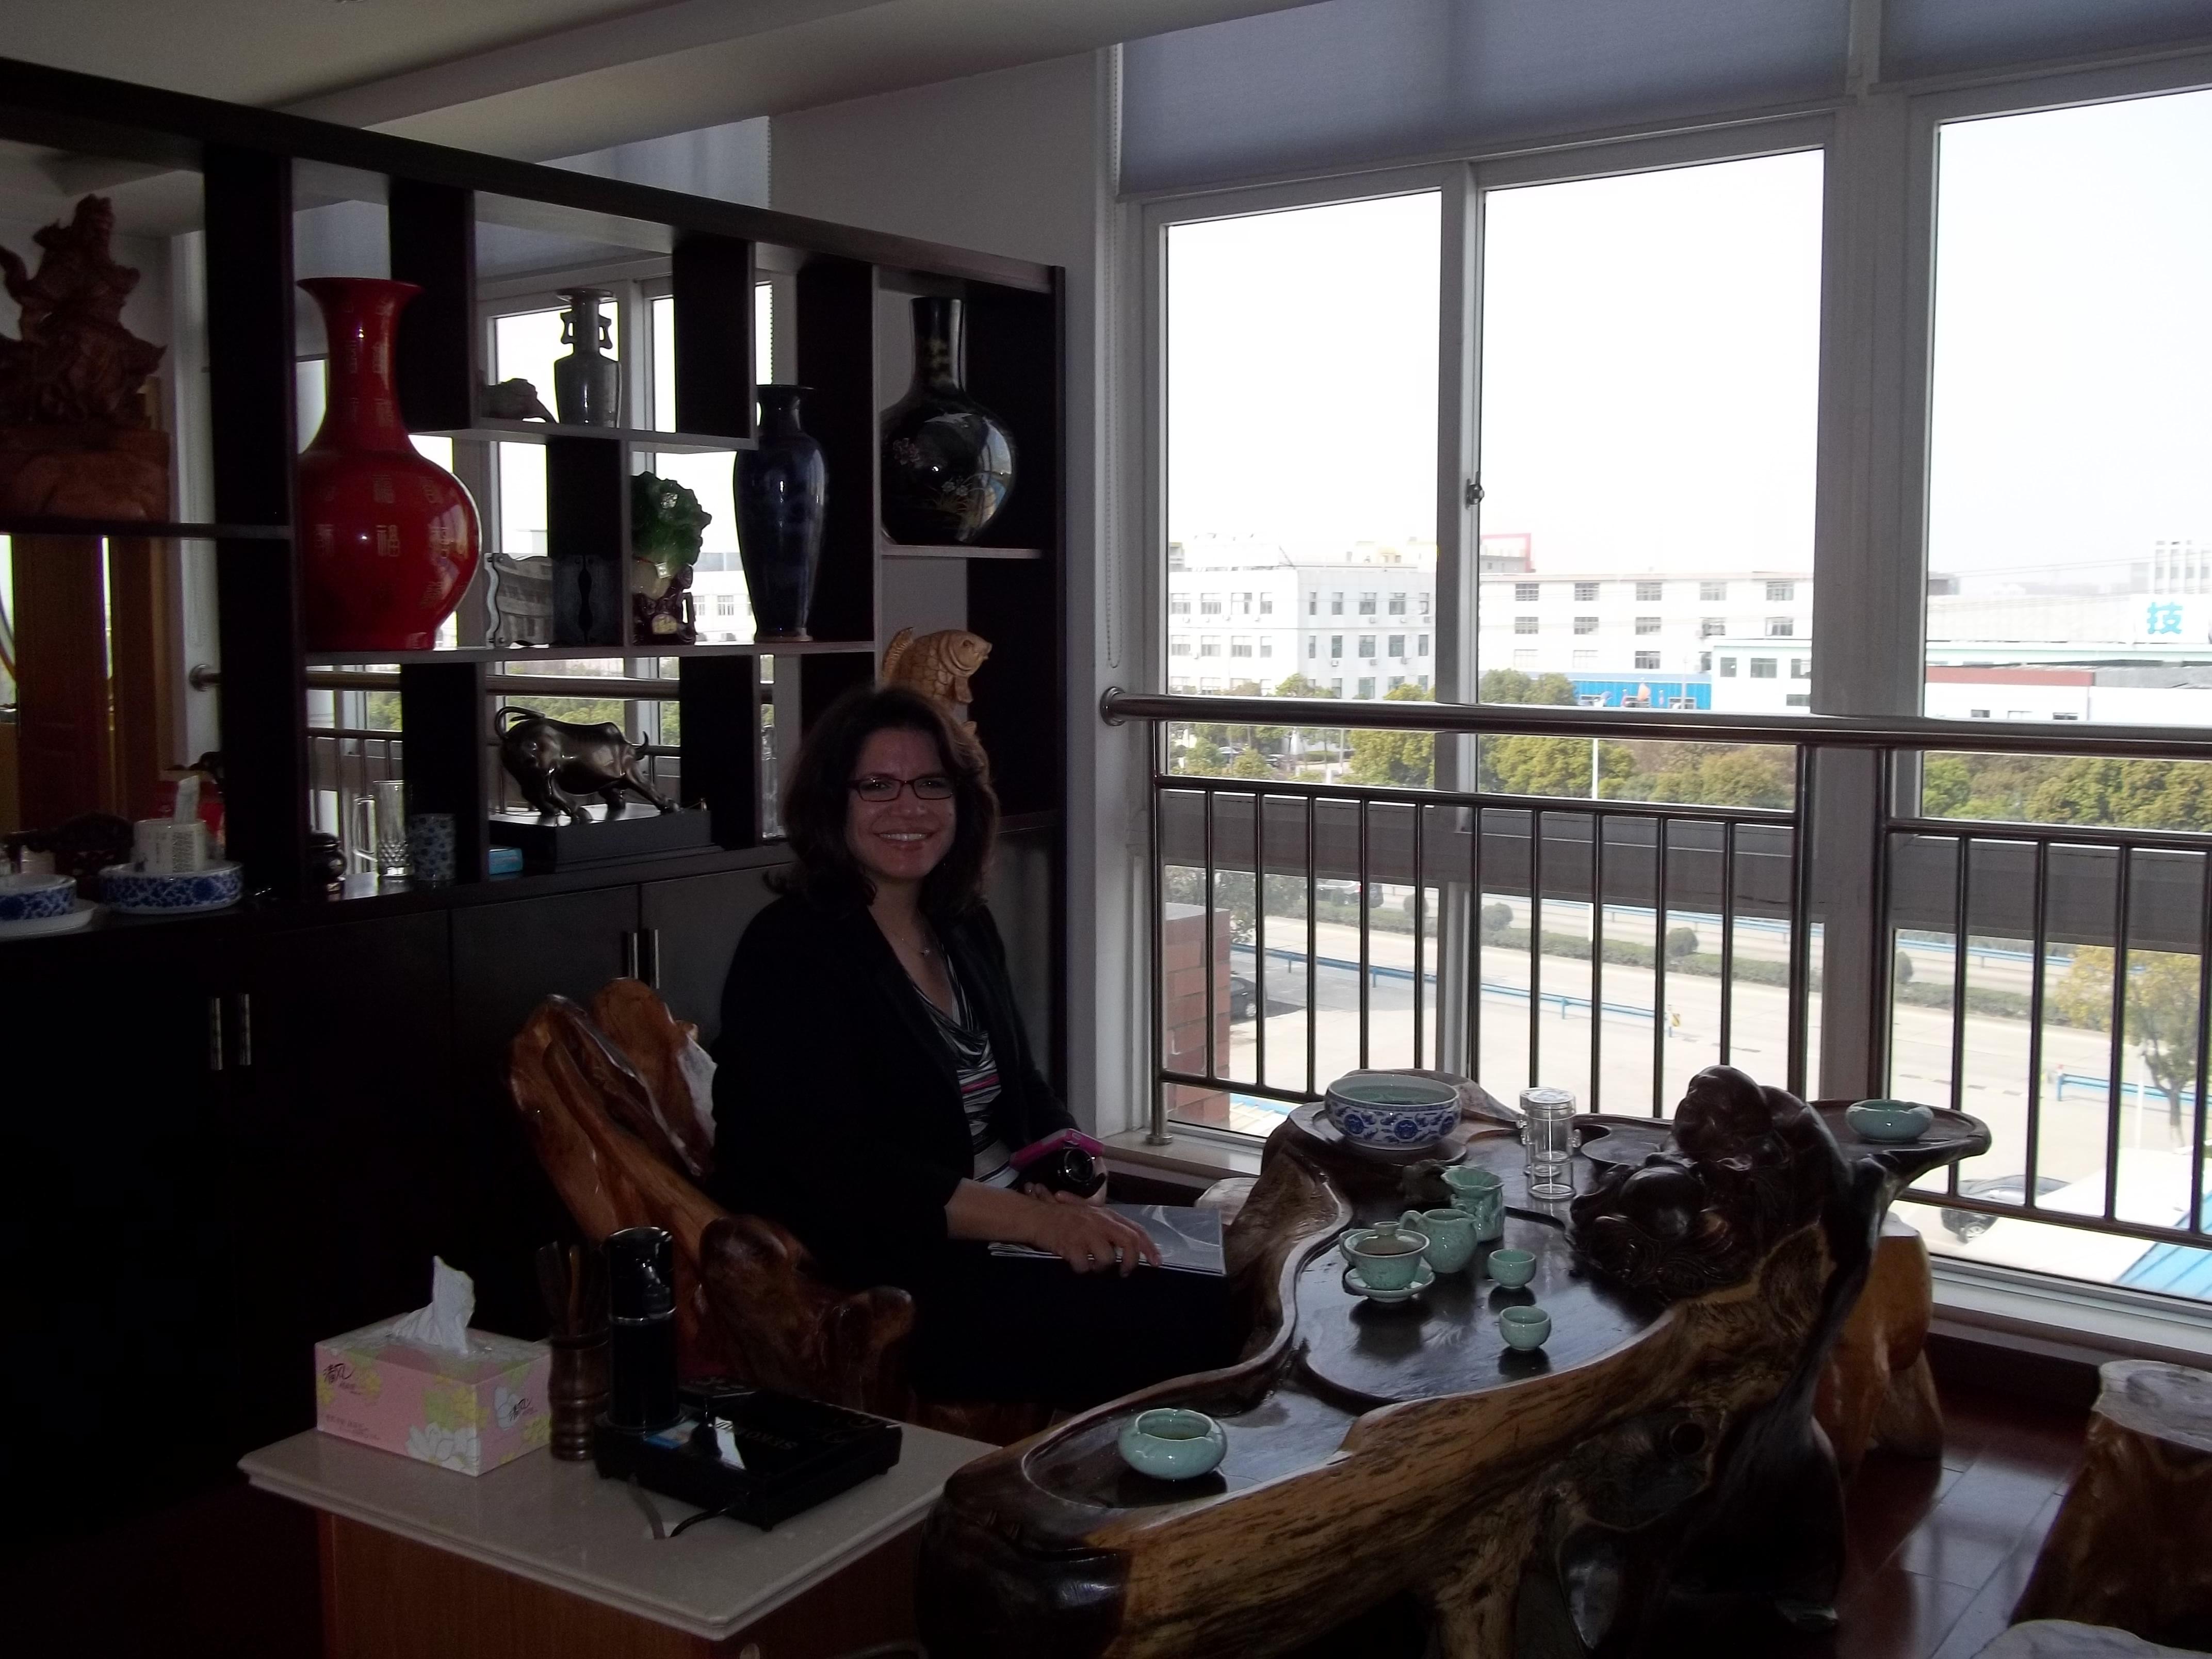 Michelle_Desk